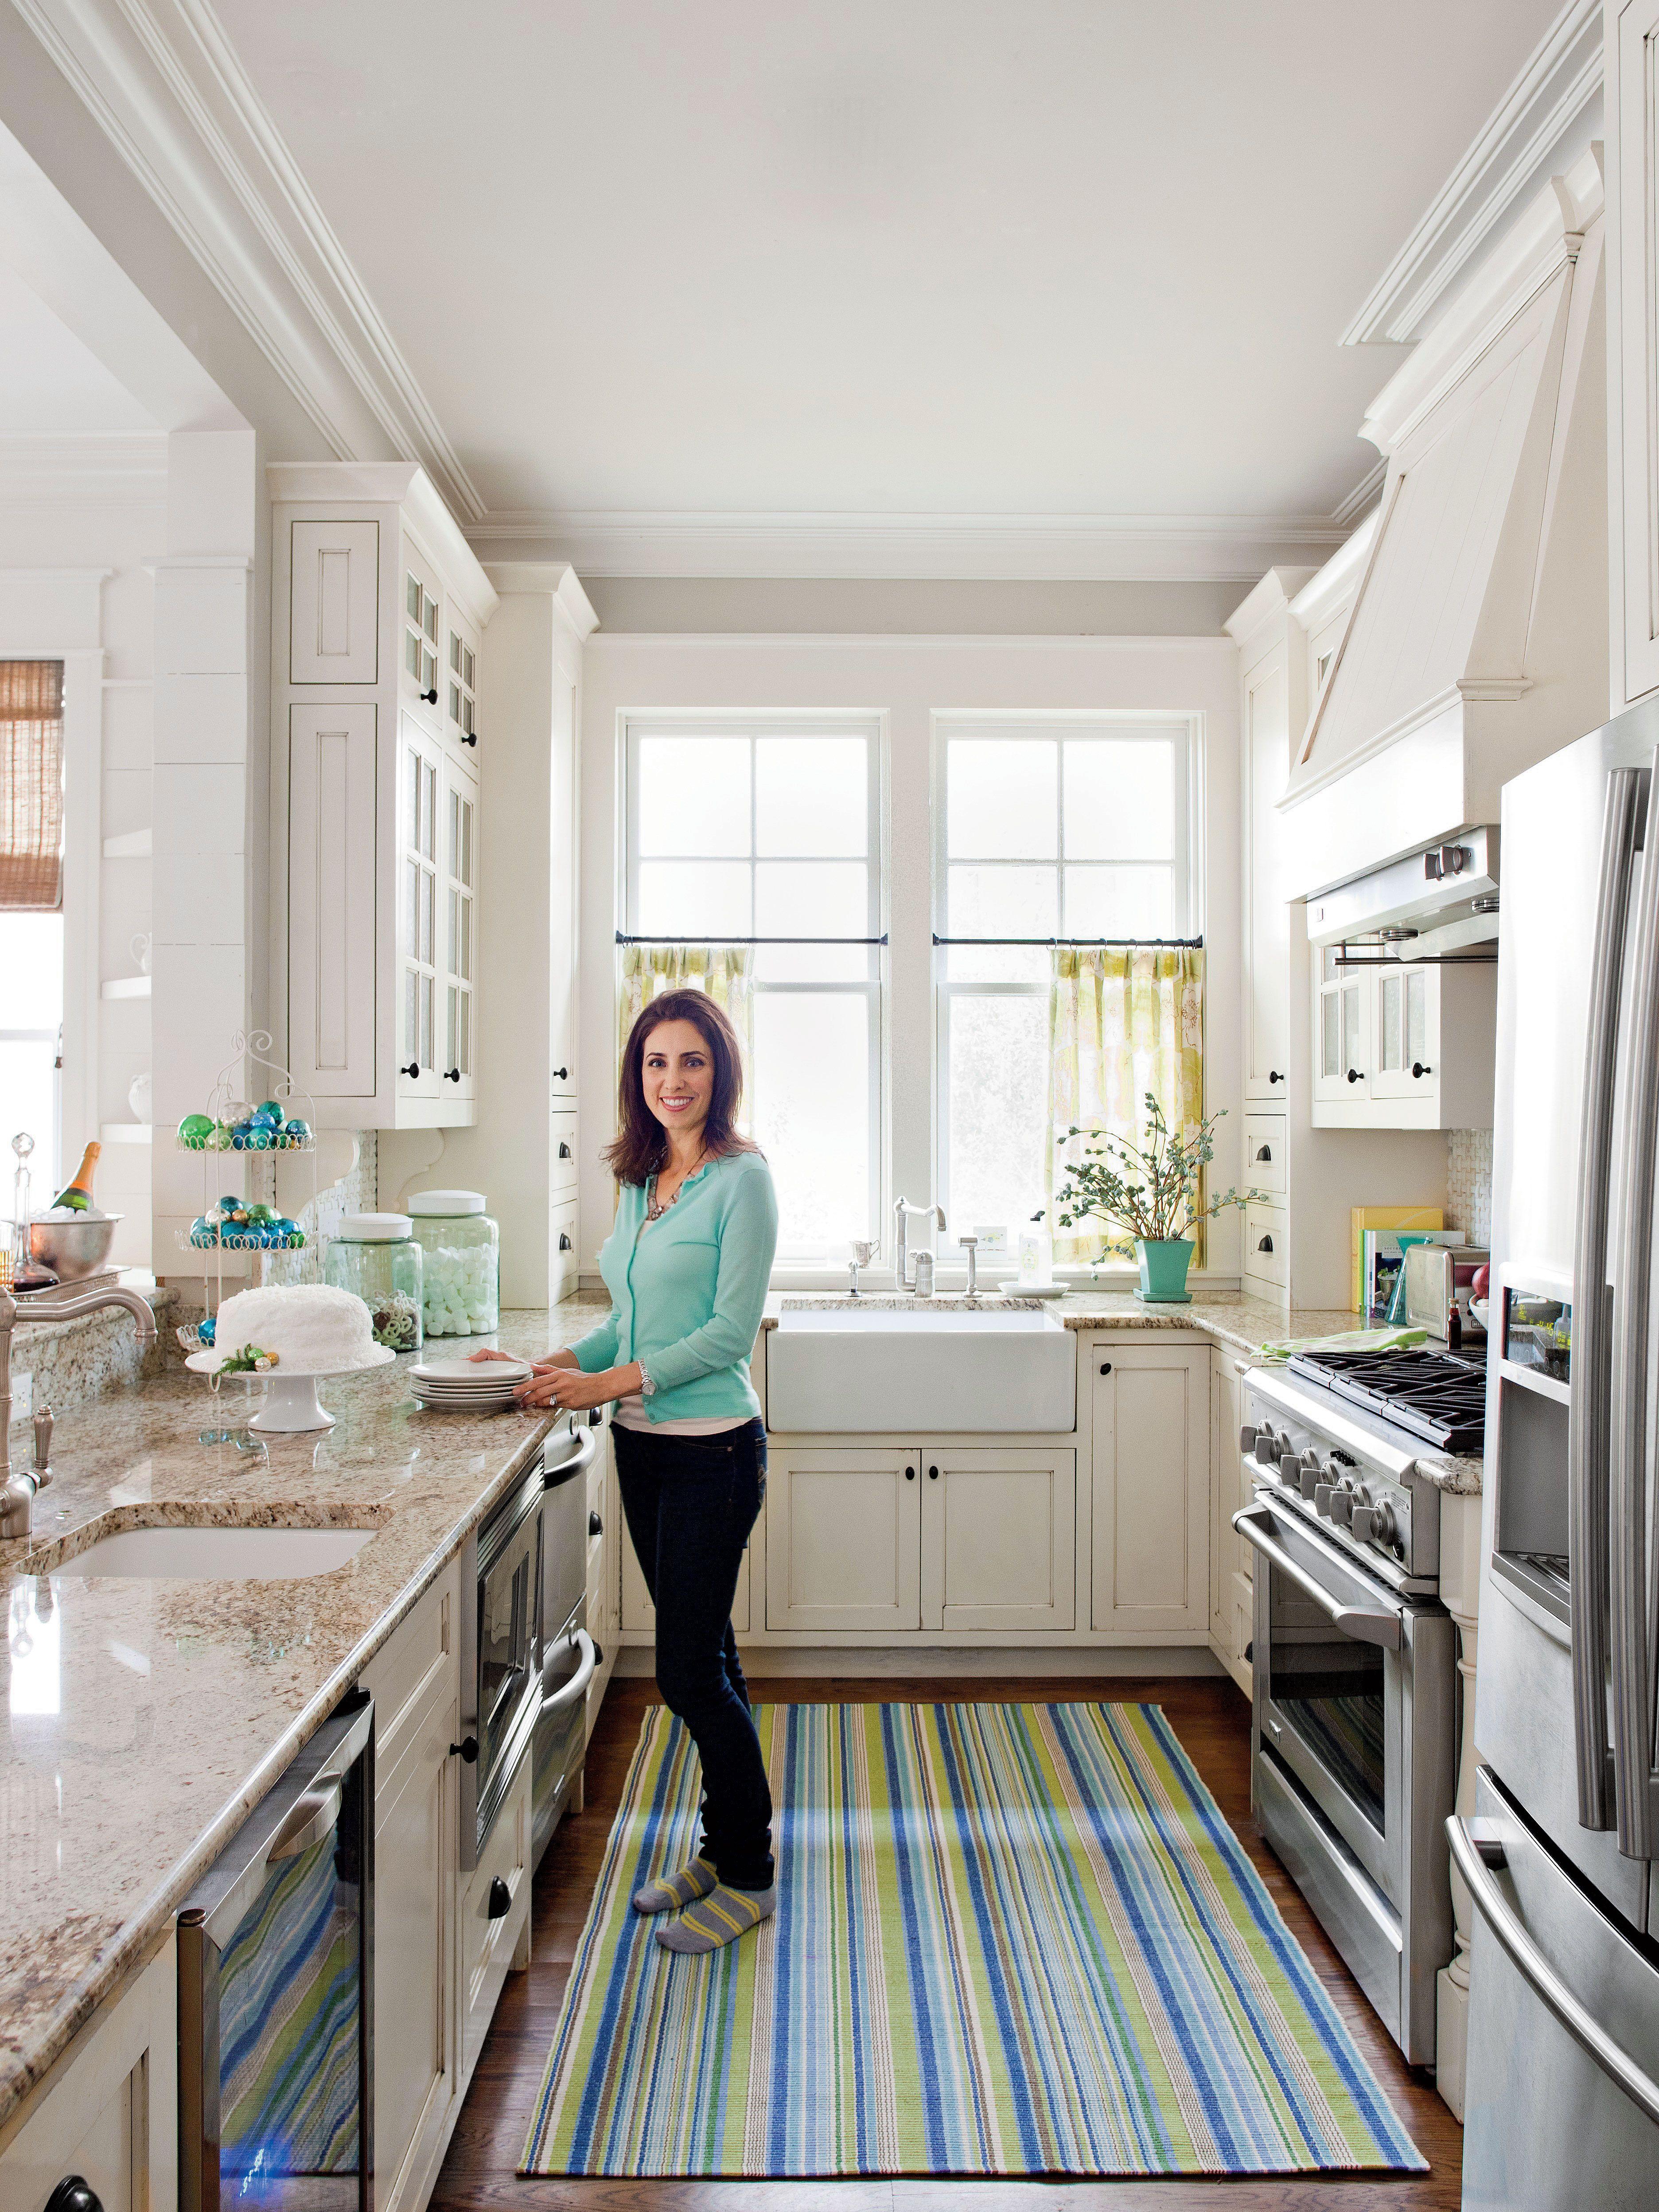 Staycation Kitchen | Interior cravings | Pinterest | Cottage ...